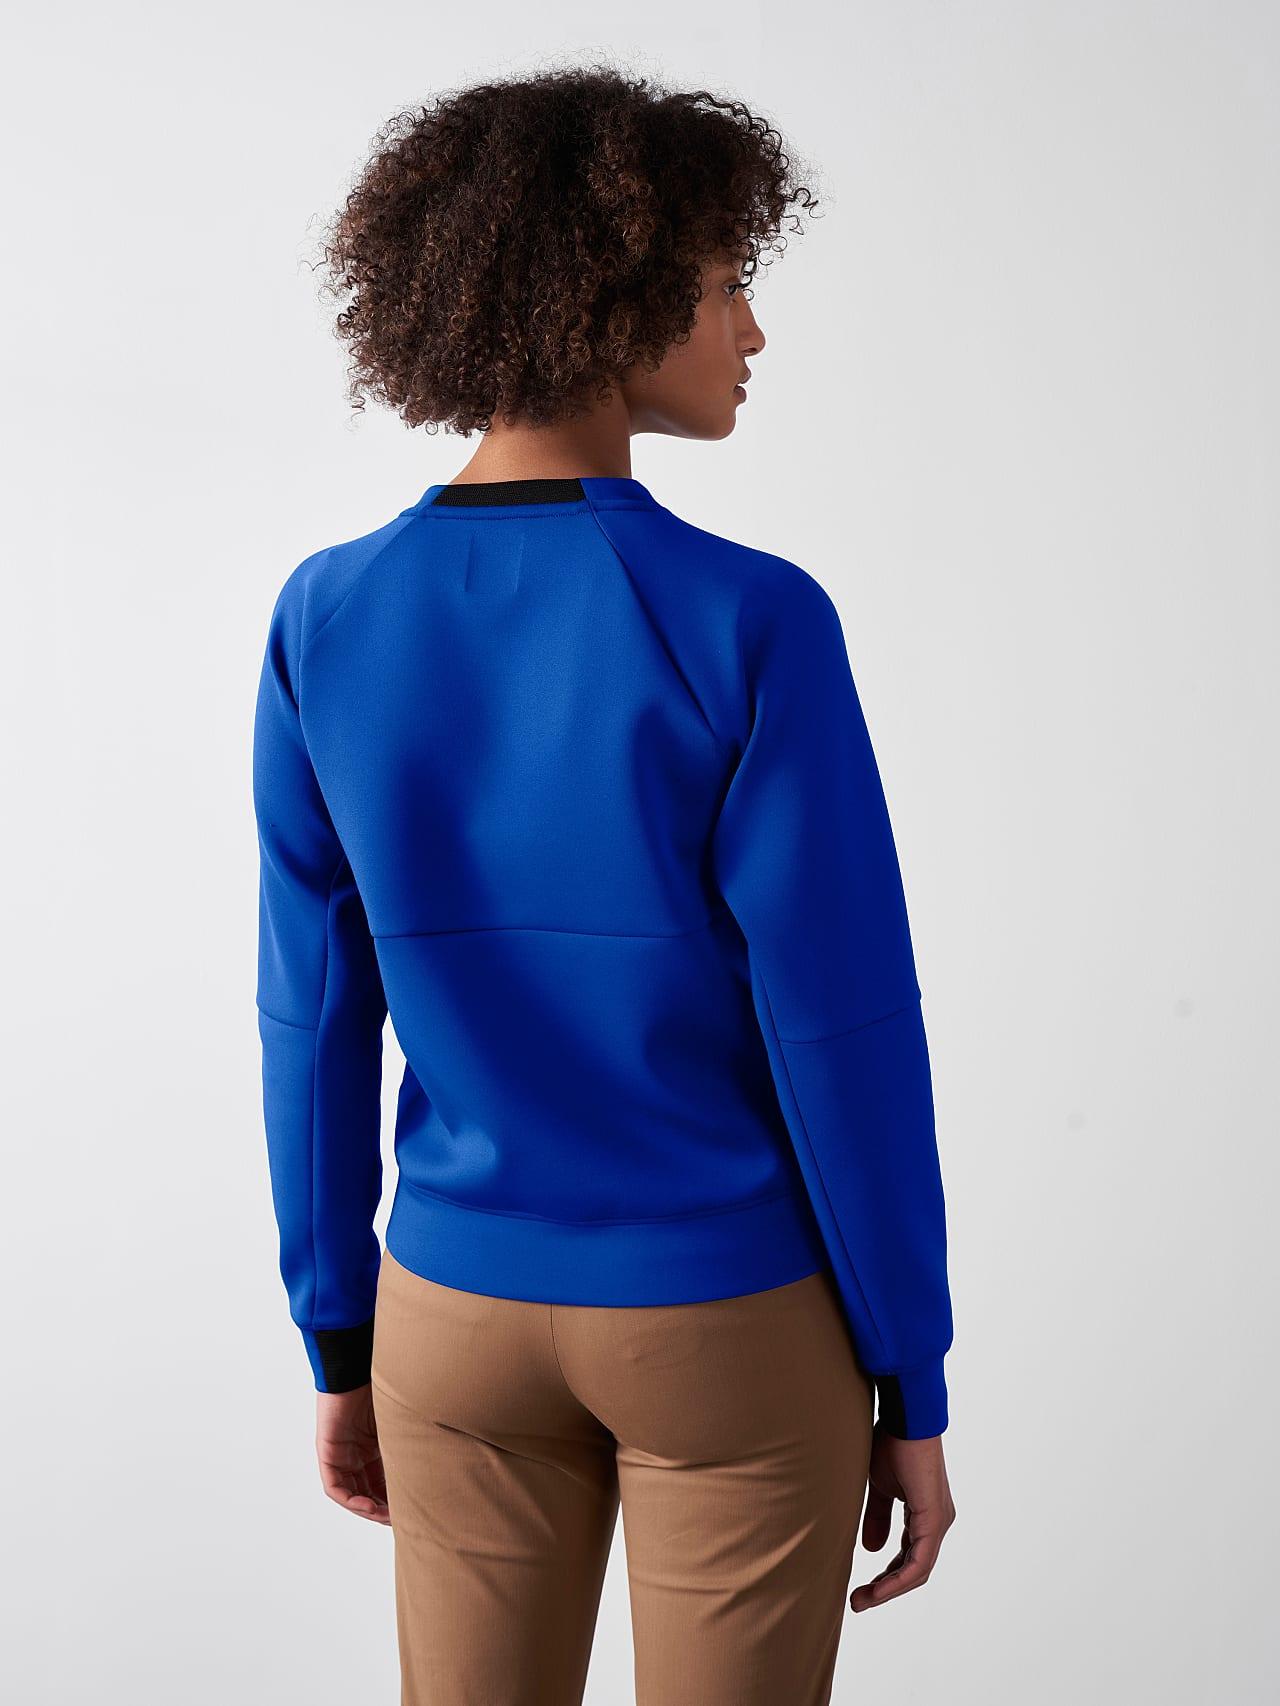 SINOV V1.Y5.01 Crewneck Sweater blue Front Main Alpha Tauri